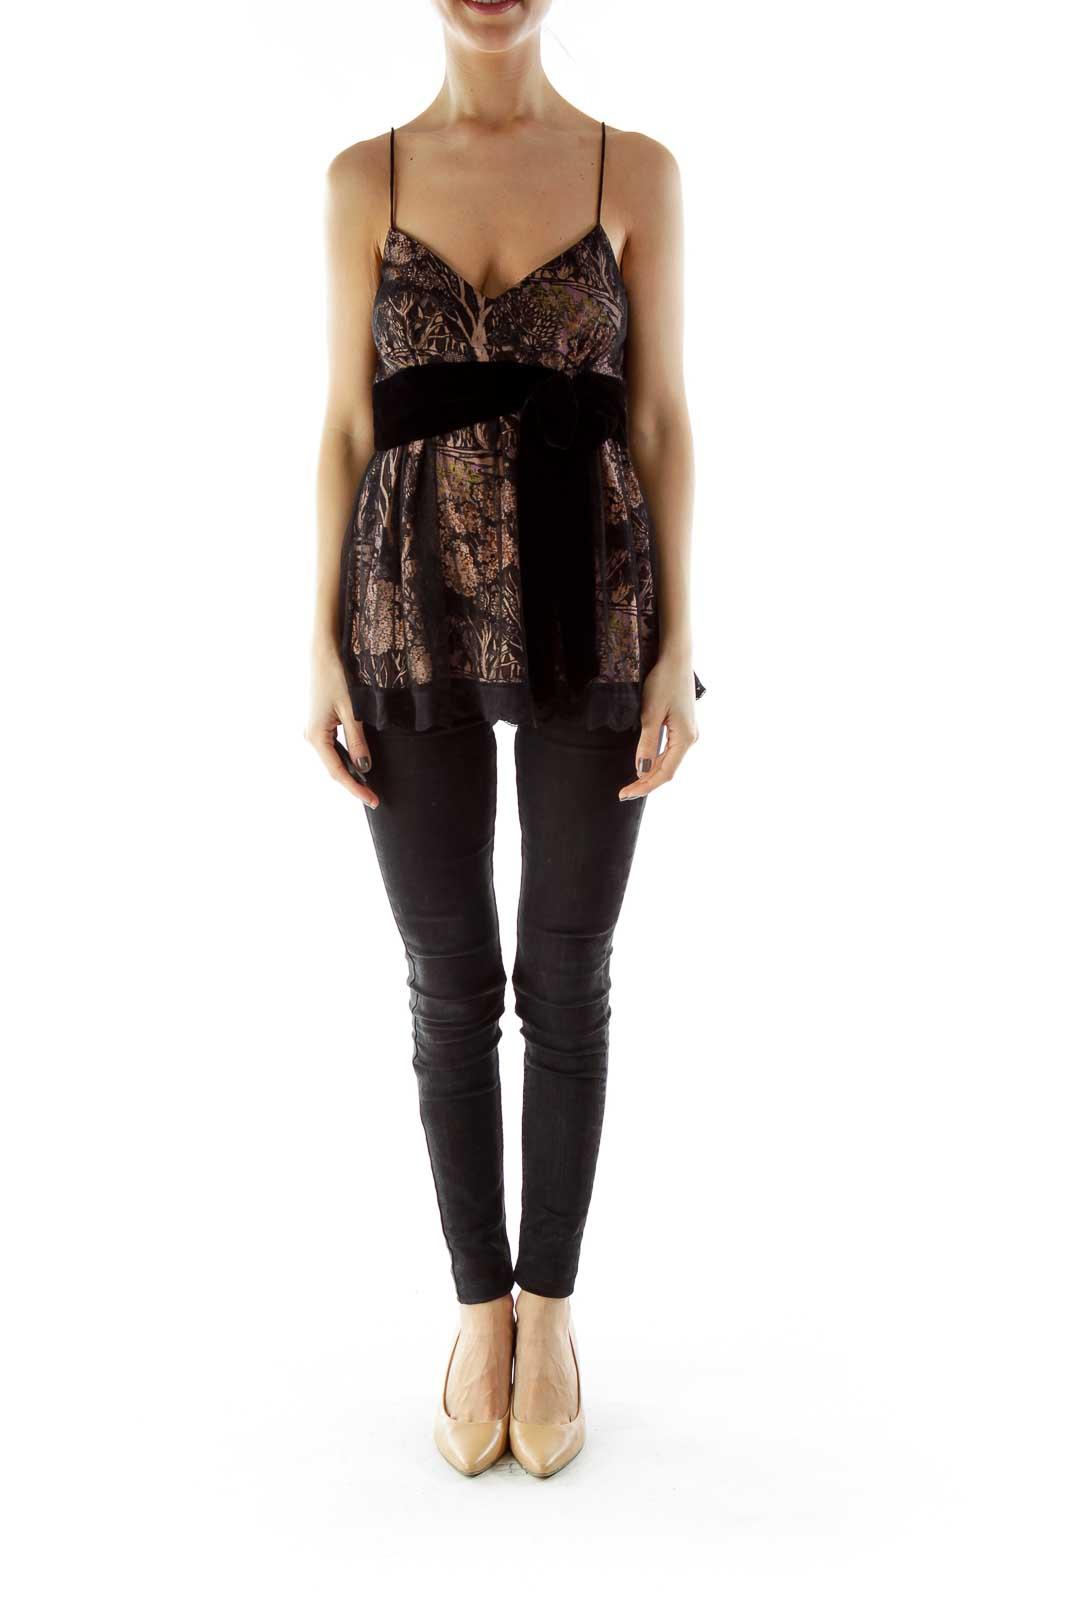 Black Tan Lace Top with Velvet Belt